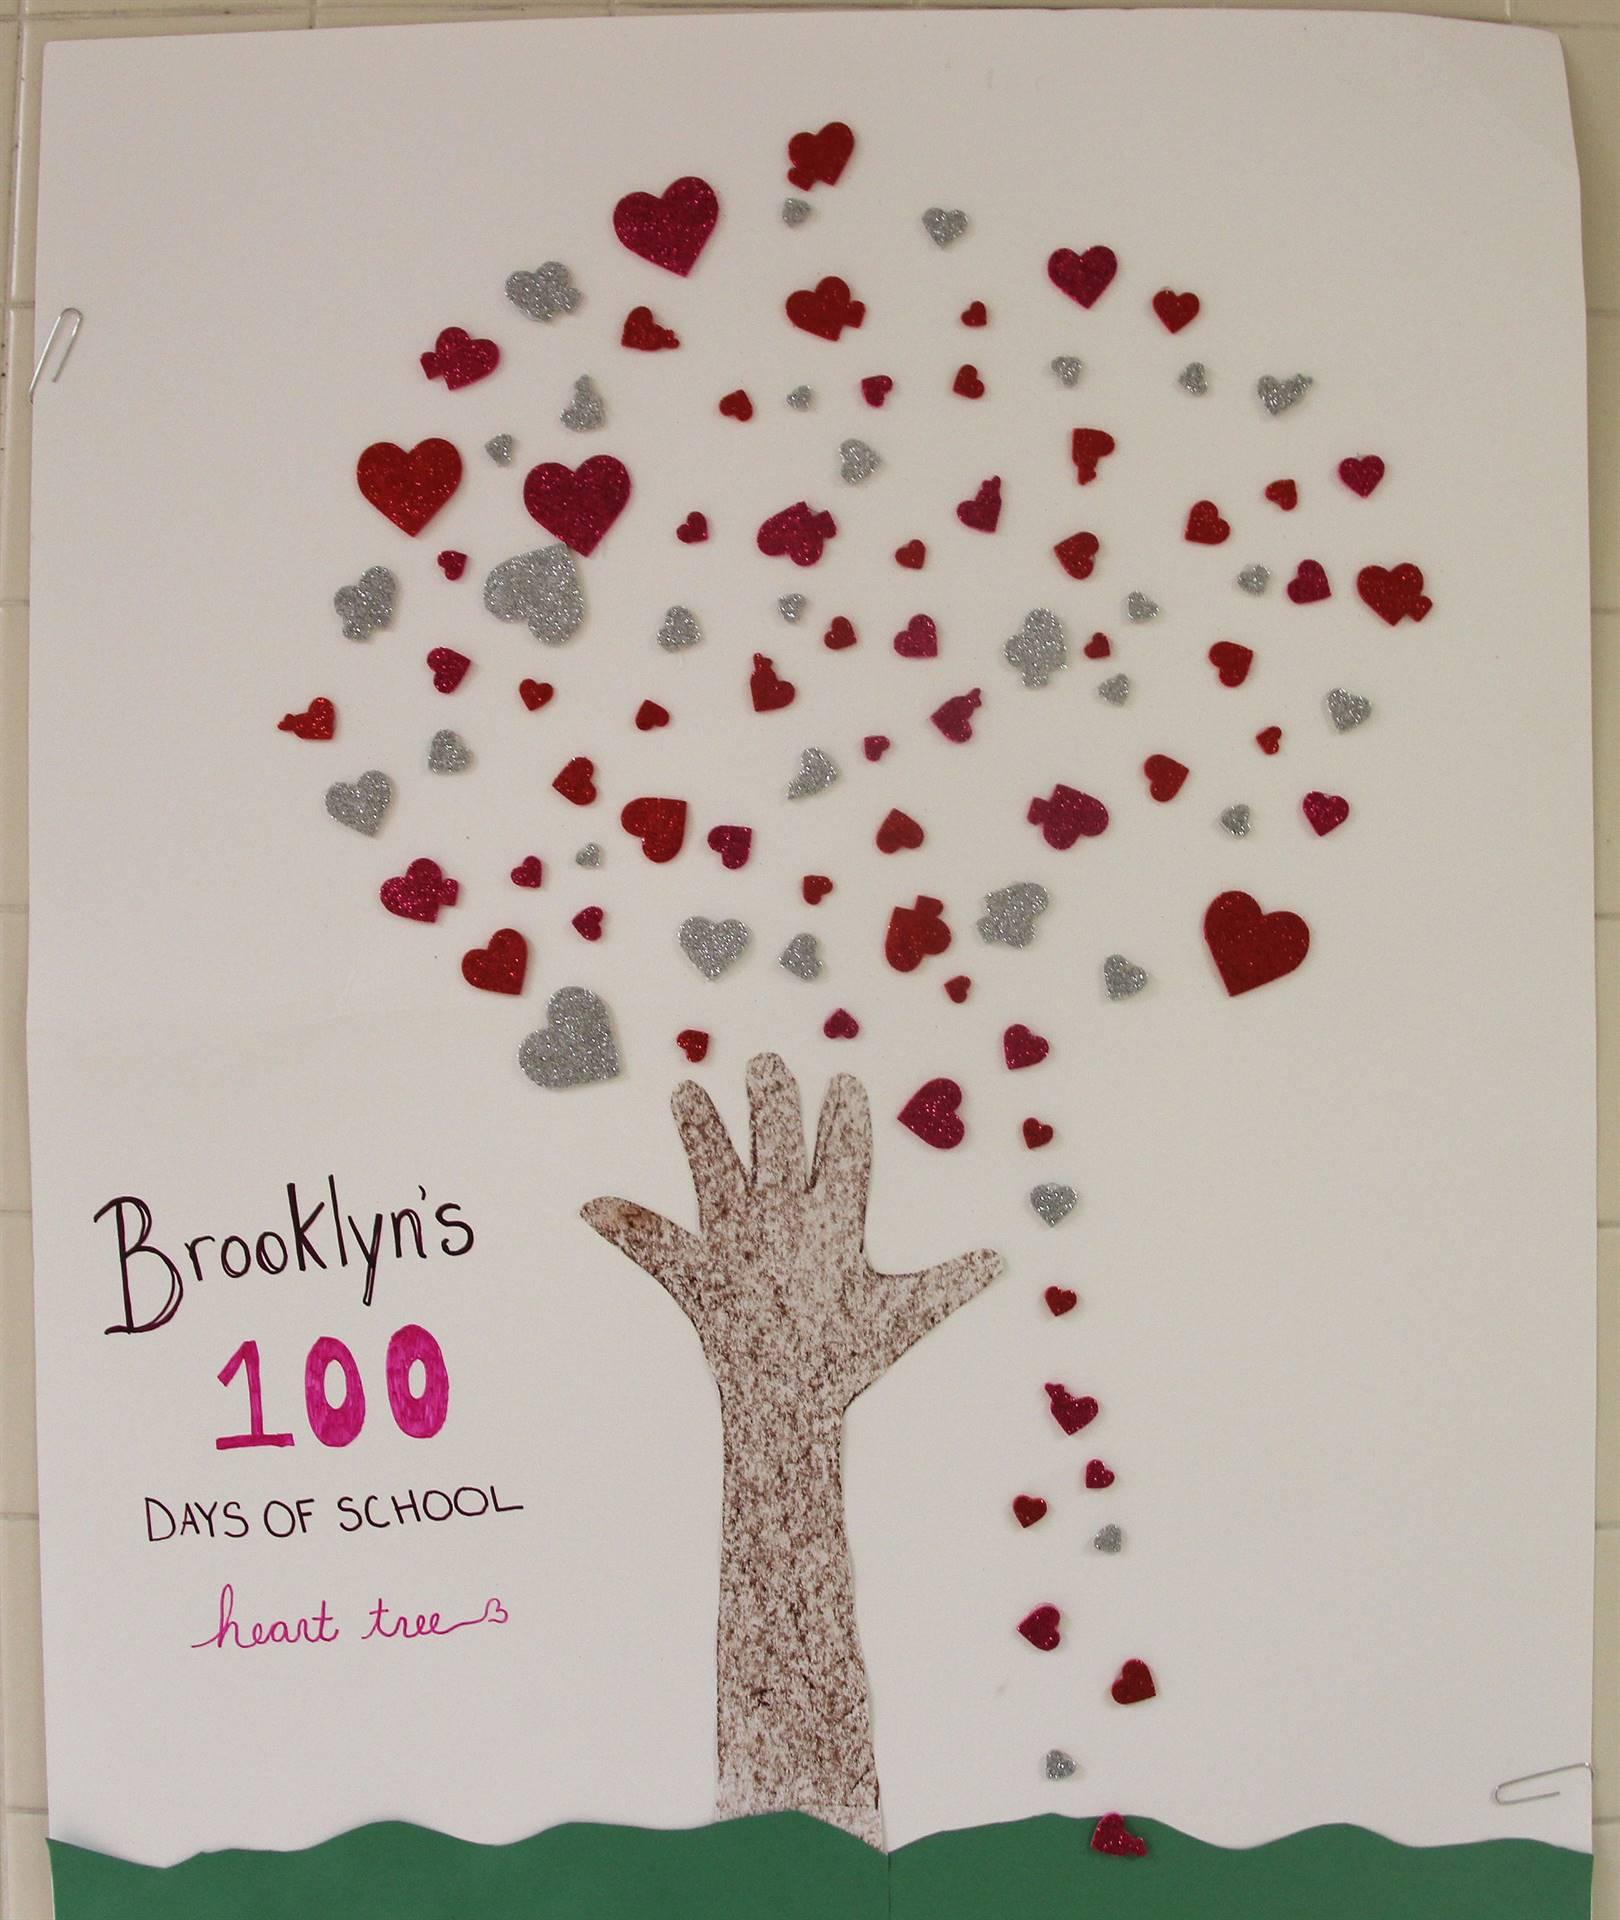 100 days of school poster